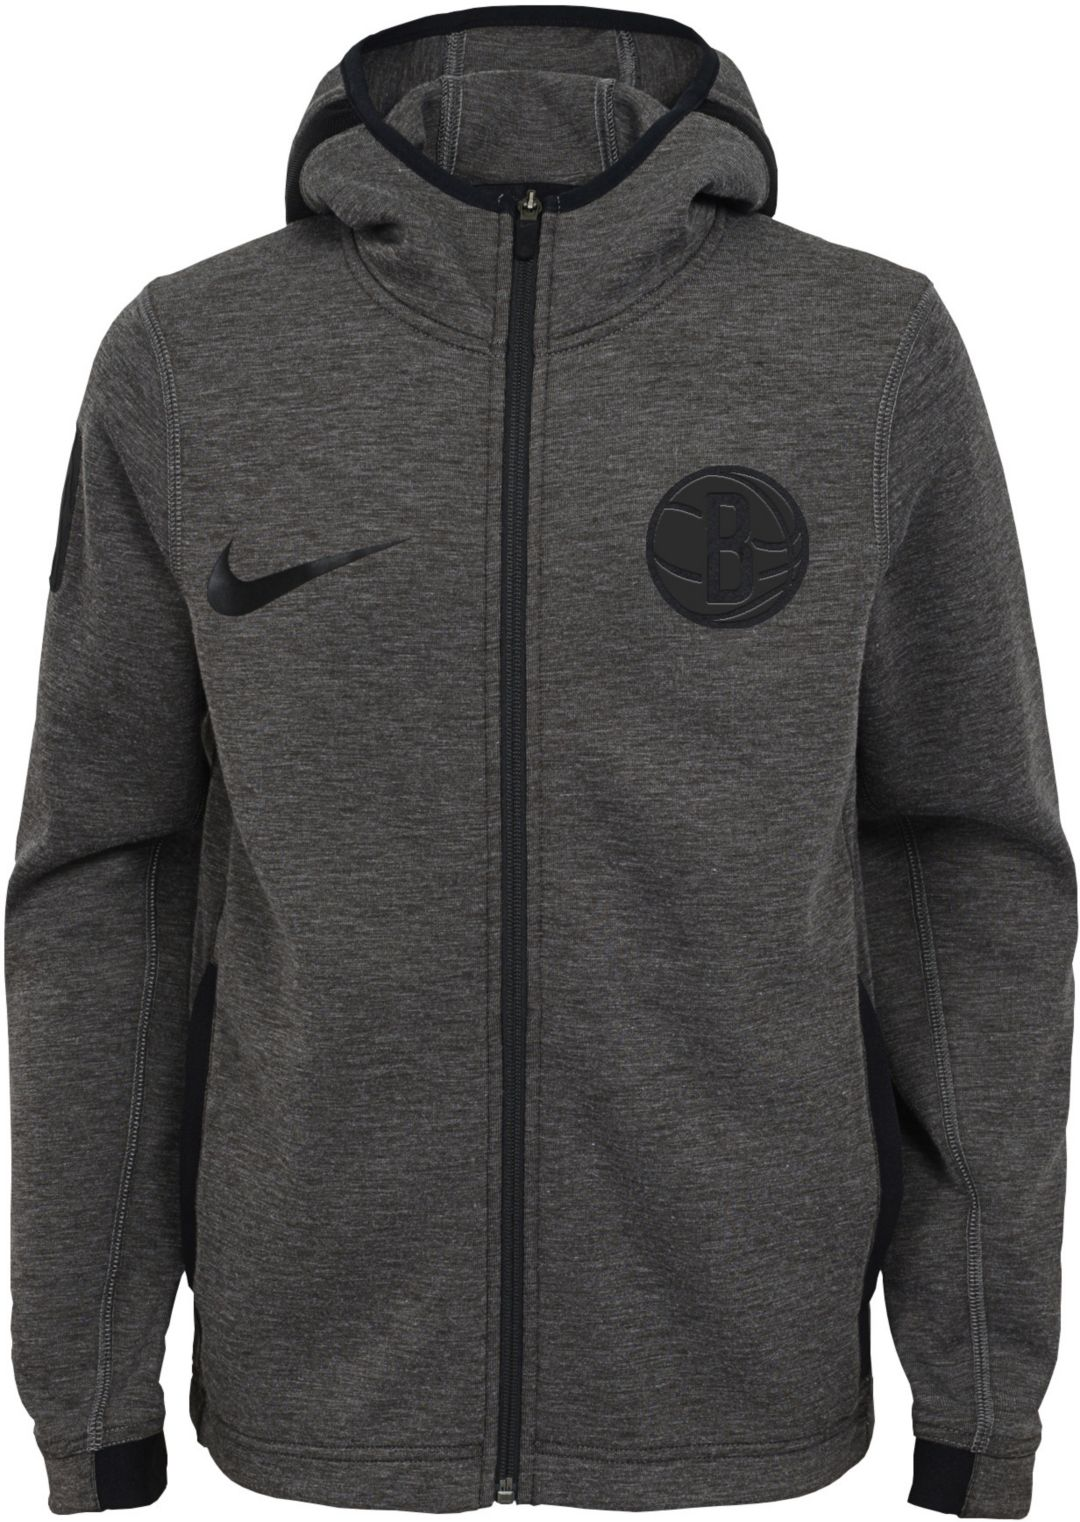 7cefa95f Nike Youth Brooklyn Nets On-Court Dri-FIT Showtime Full-Zip Hoodie ...